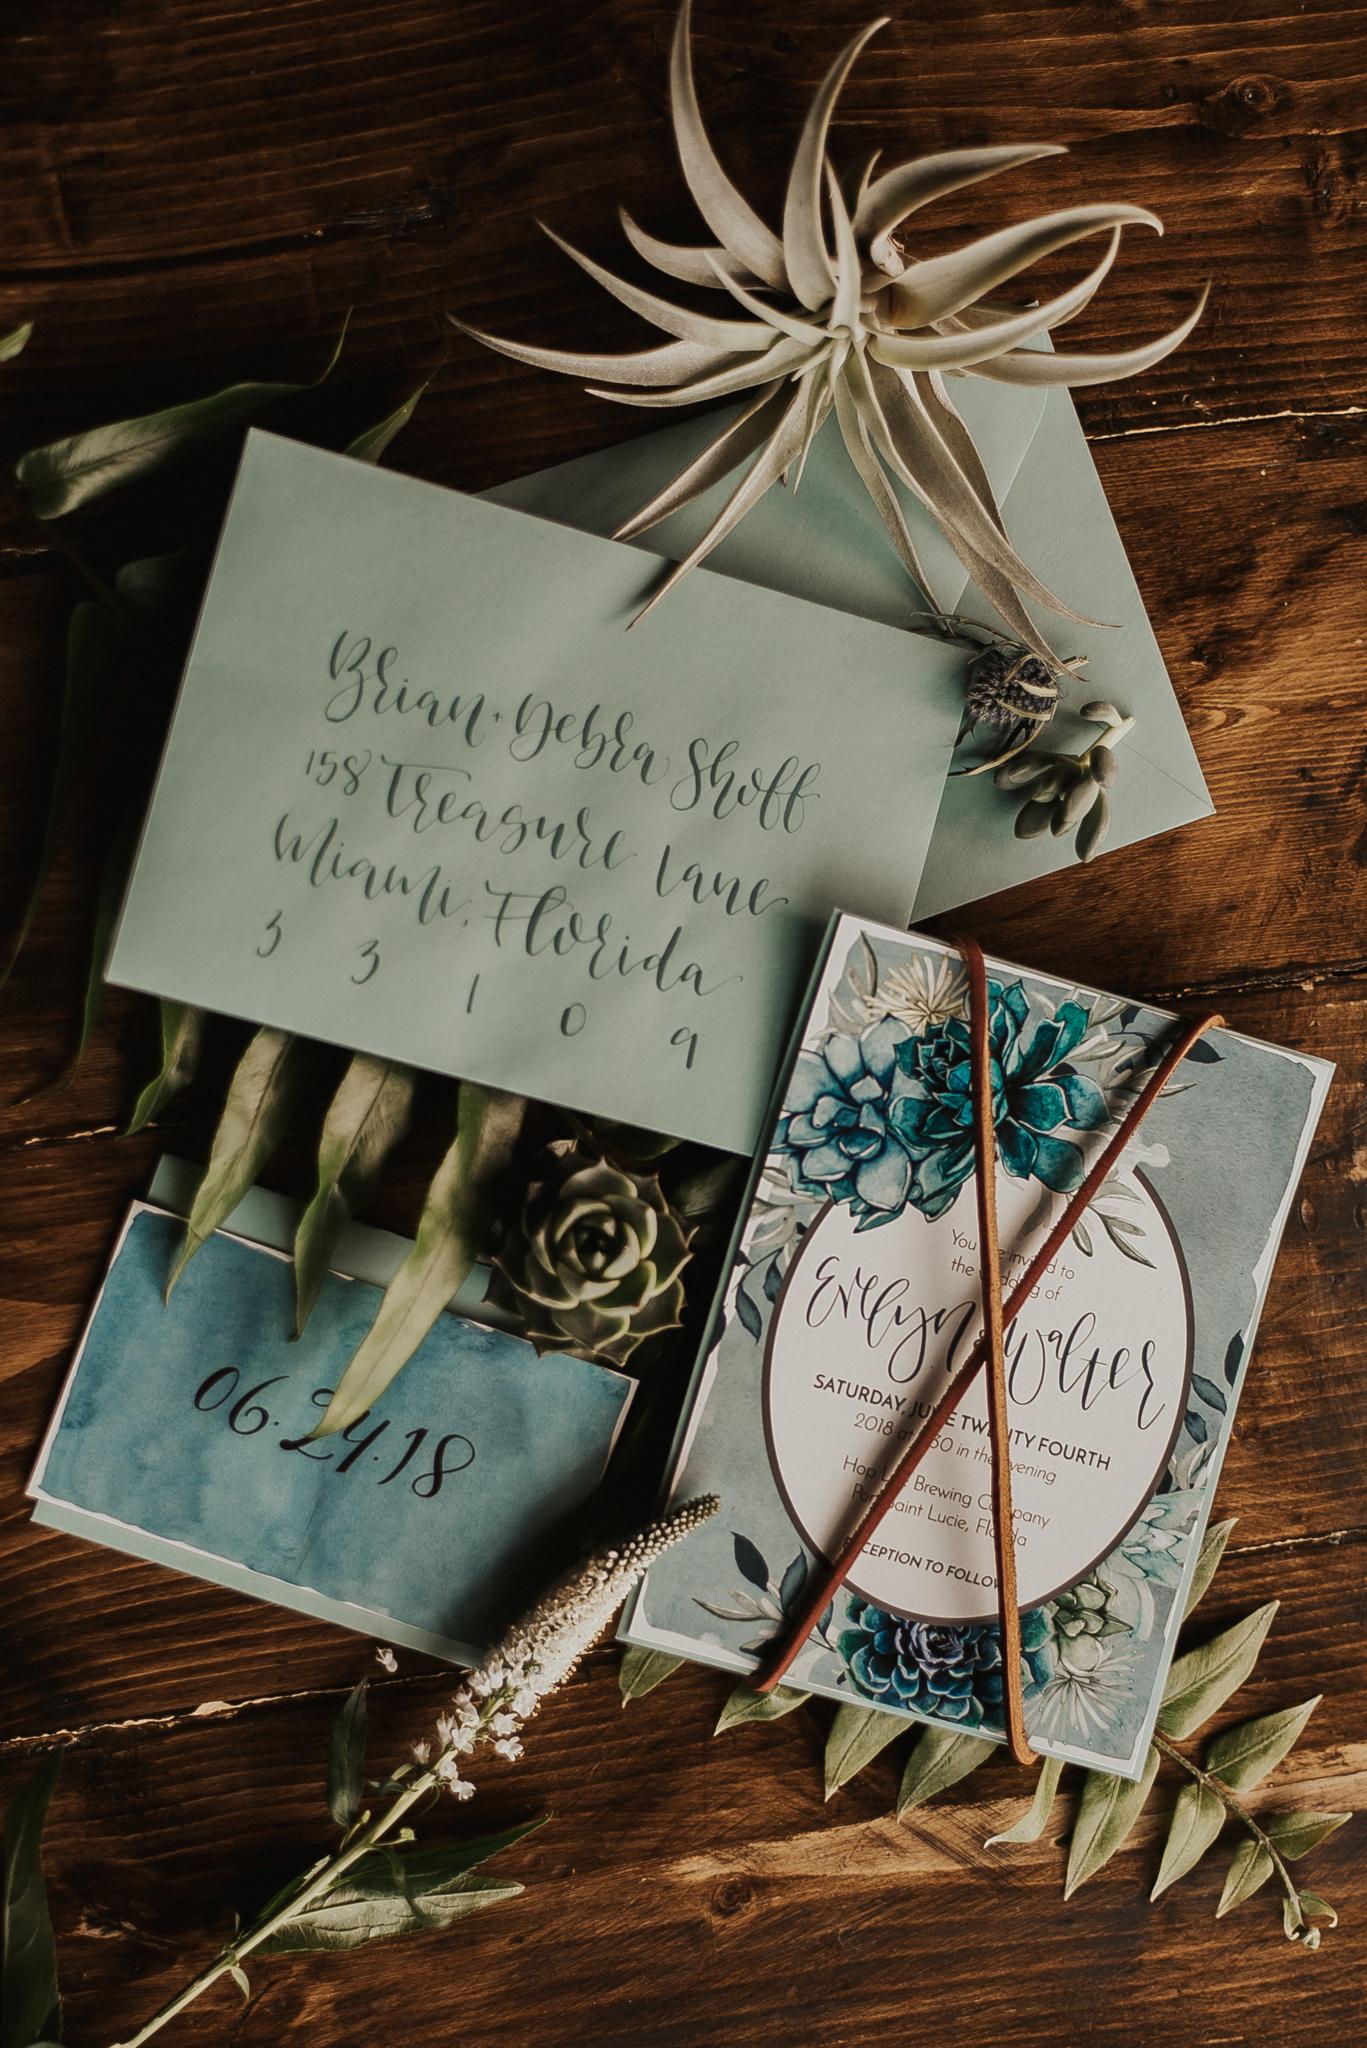 love-fern-design-studio-custom-wedding-invitations-for-the-modern-couple-modern-calligraphy-in-seattle-washington-custom-wedding-stationery-teal-watercolor-southern-boho-invitation-suite